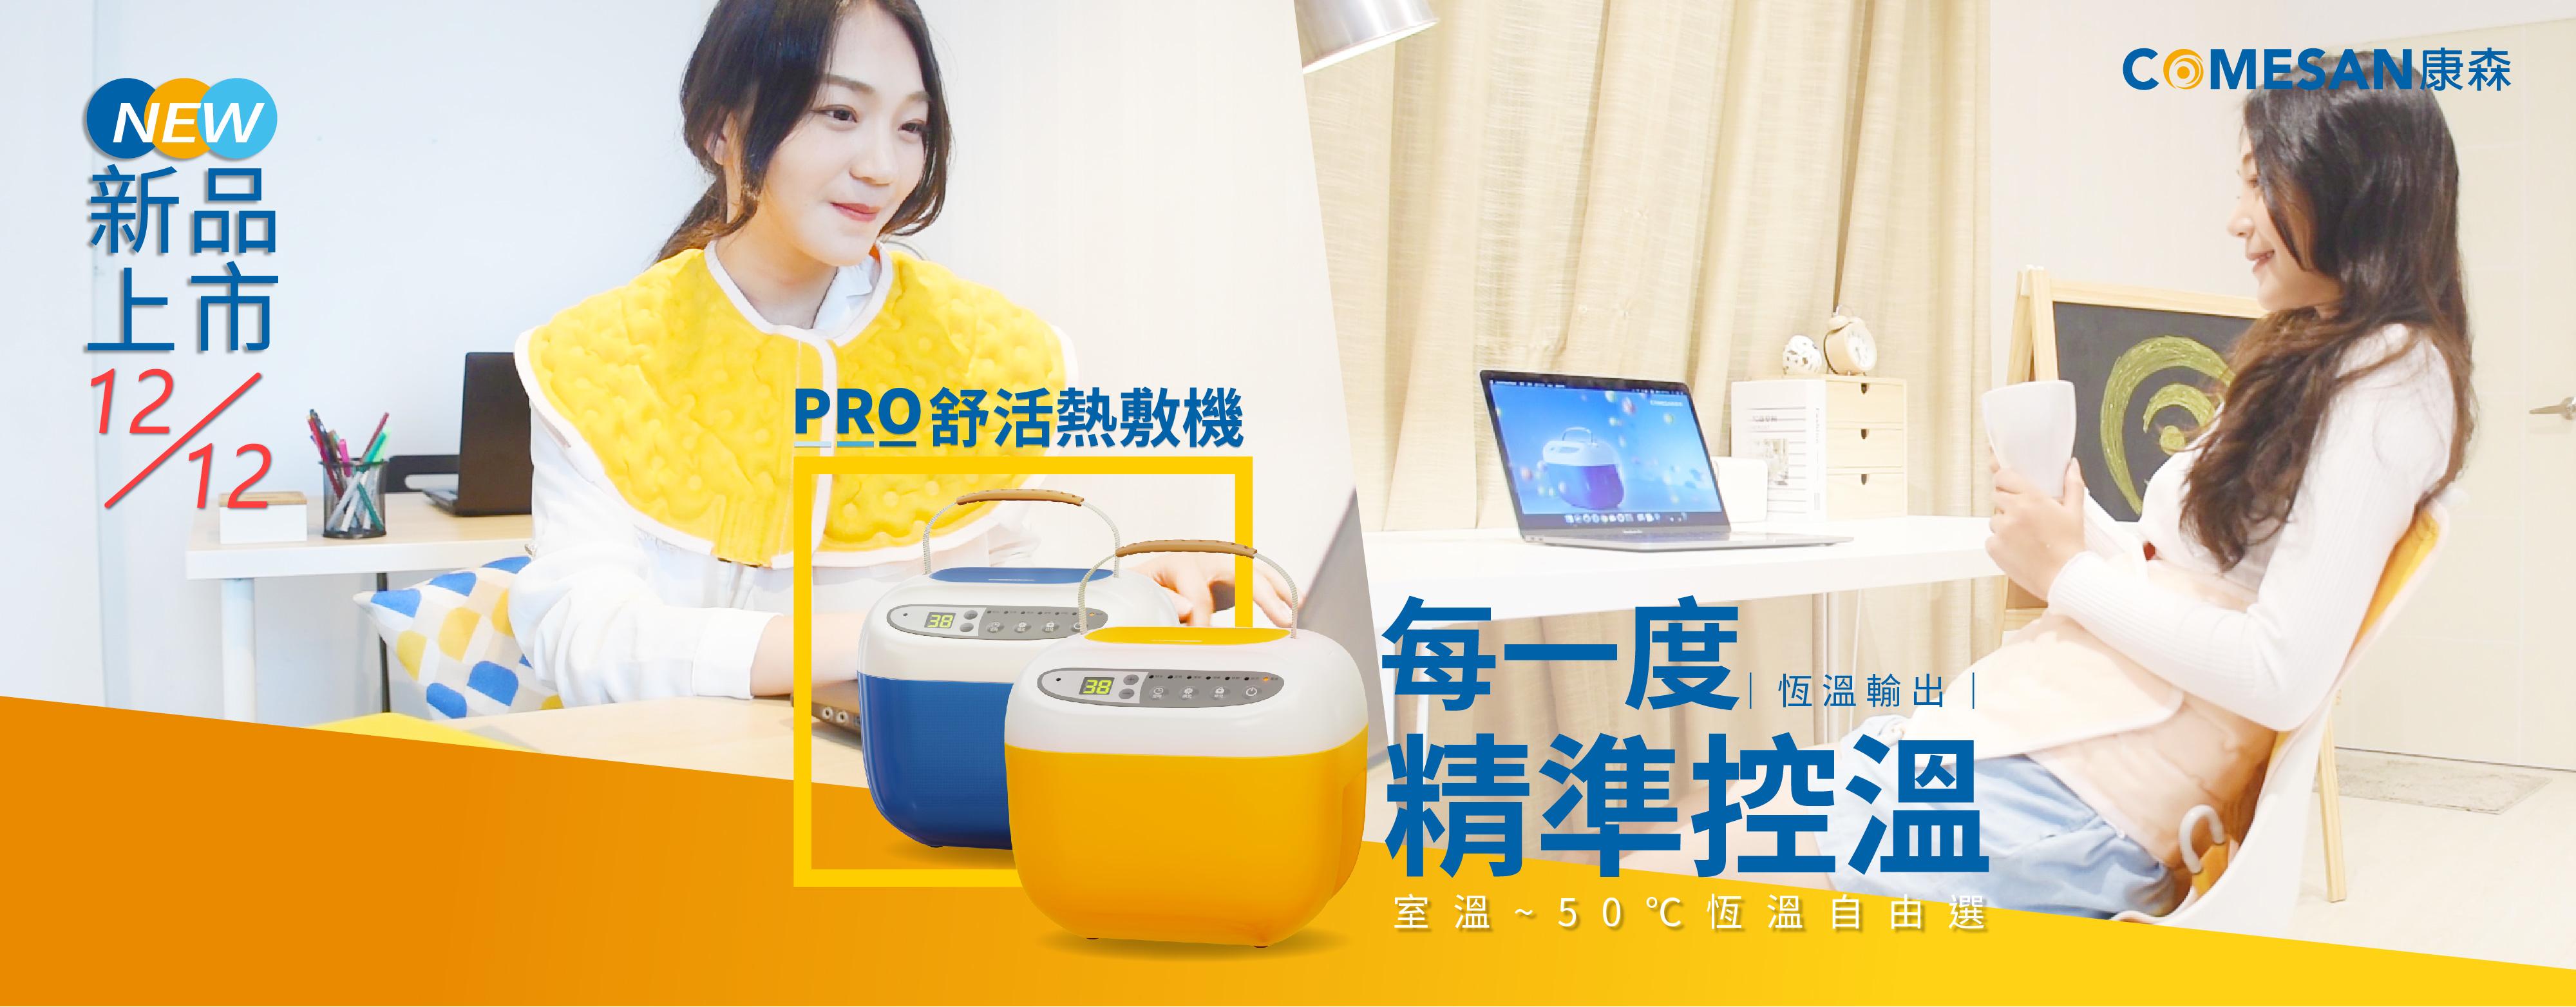 COMESAN康森PRO舒活熱敷機,每一度都精準控溫控時:室溫到50度恆溫自由選。